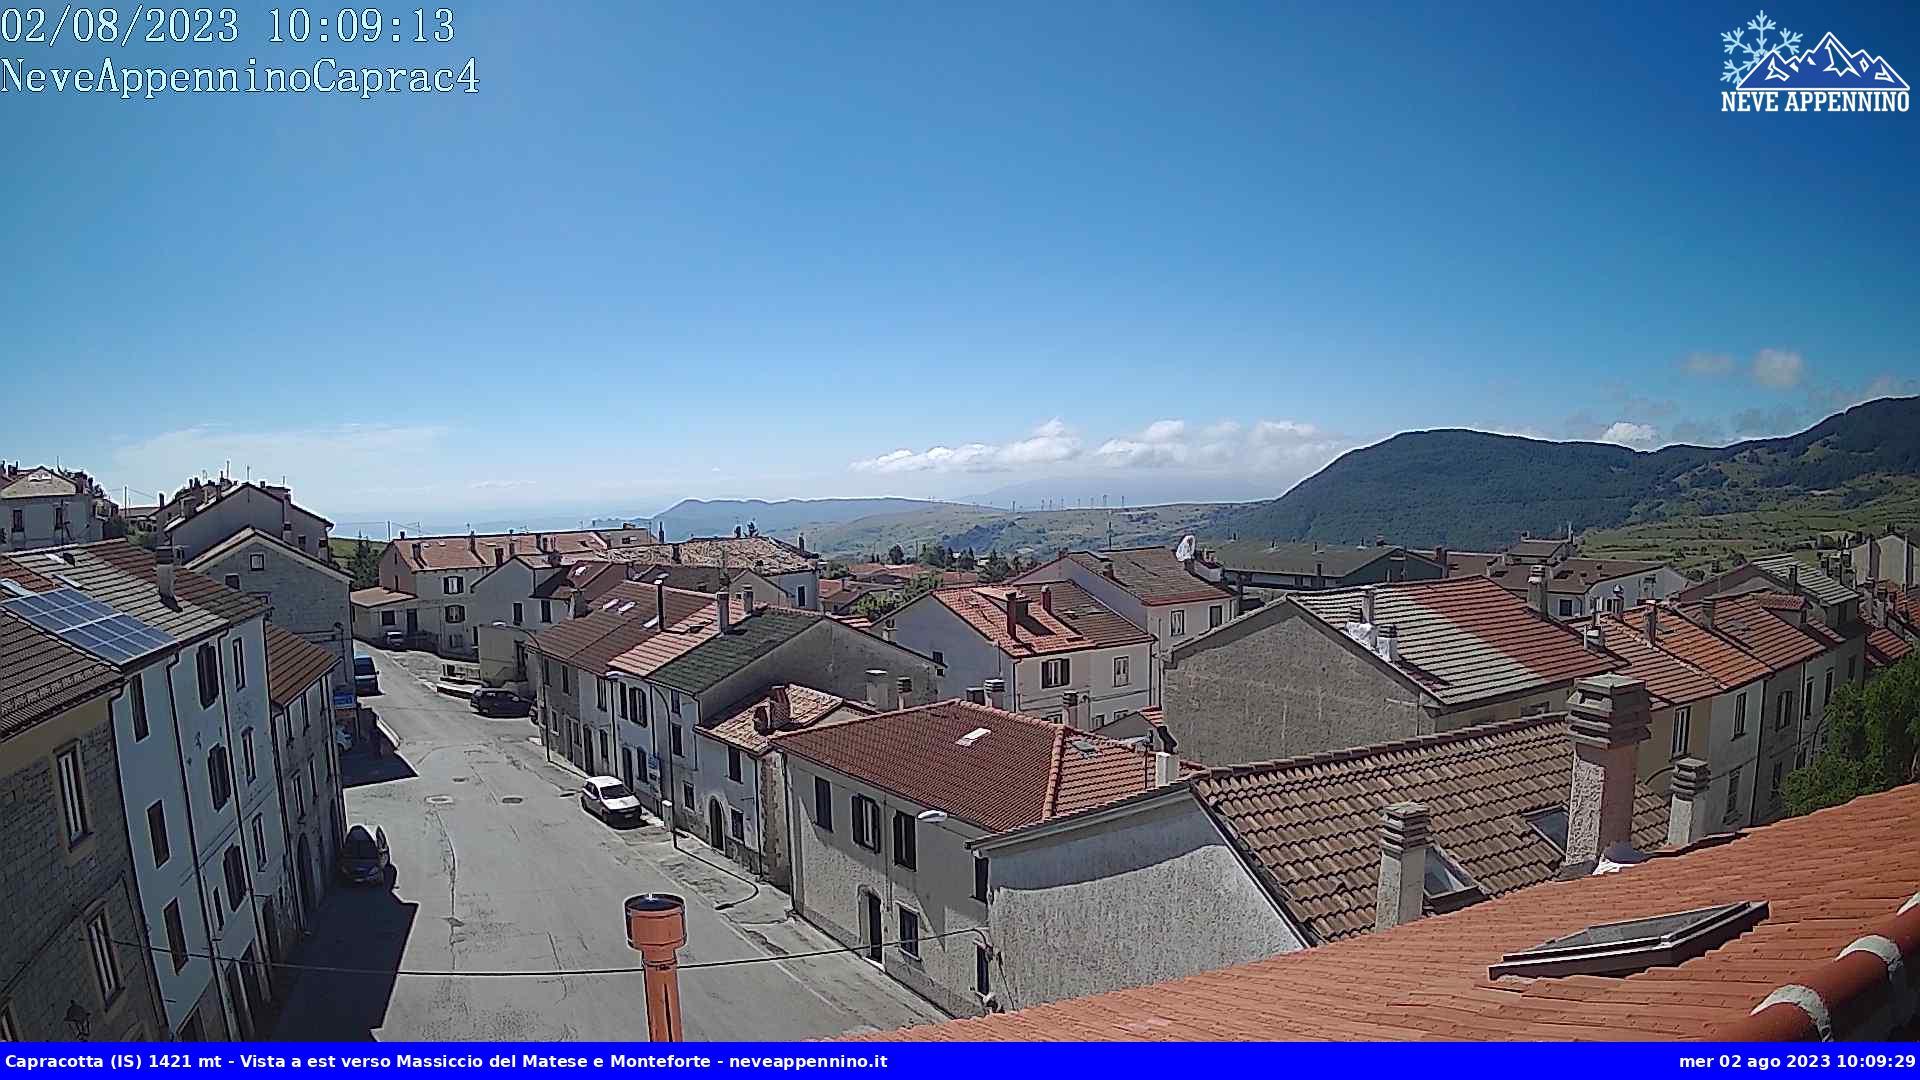 webcam comune di Capracotta (IS) 1421 m.s.l.m., Molise Italy